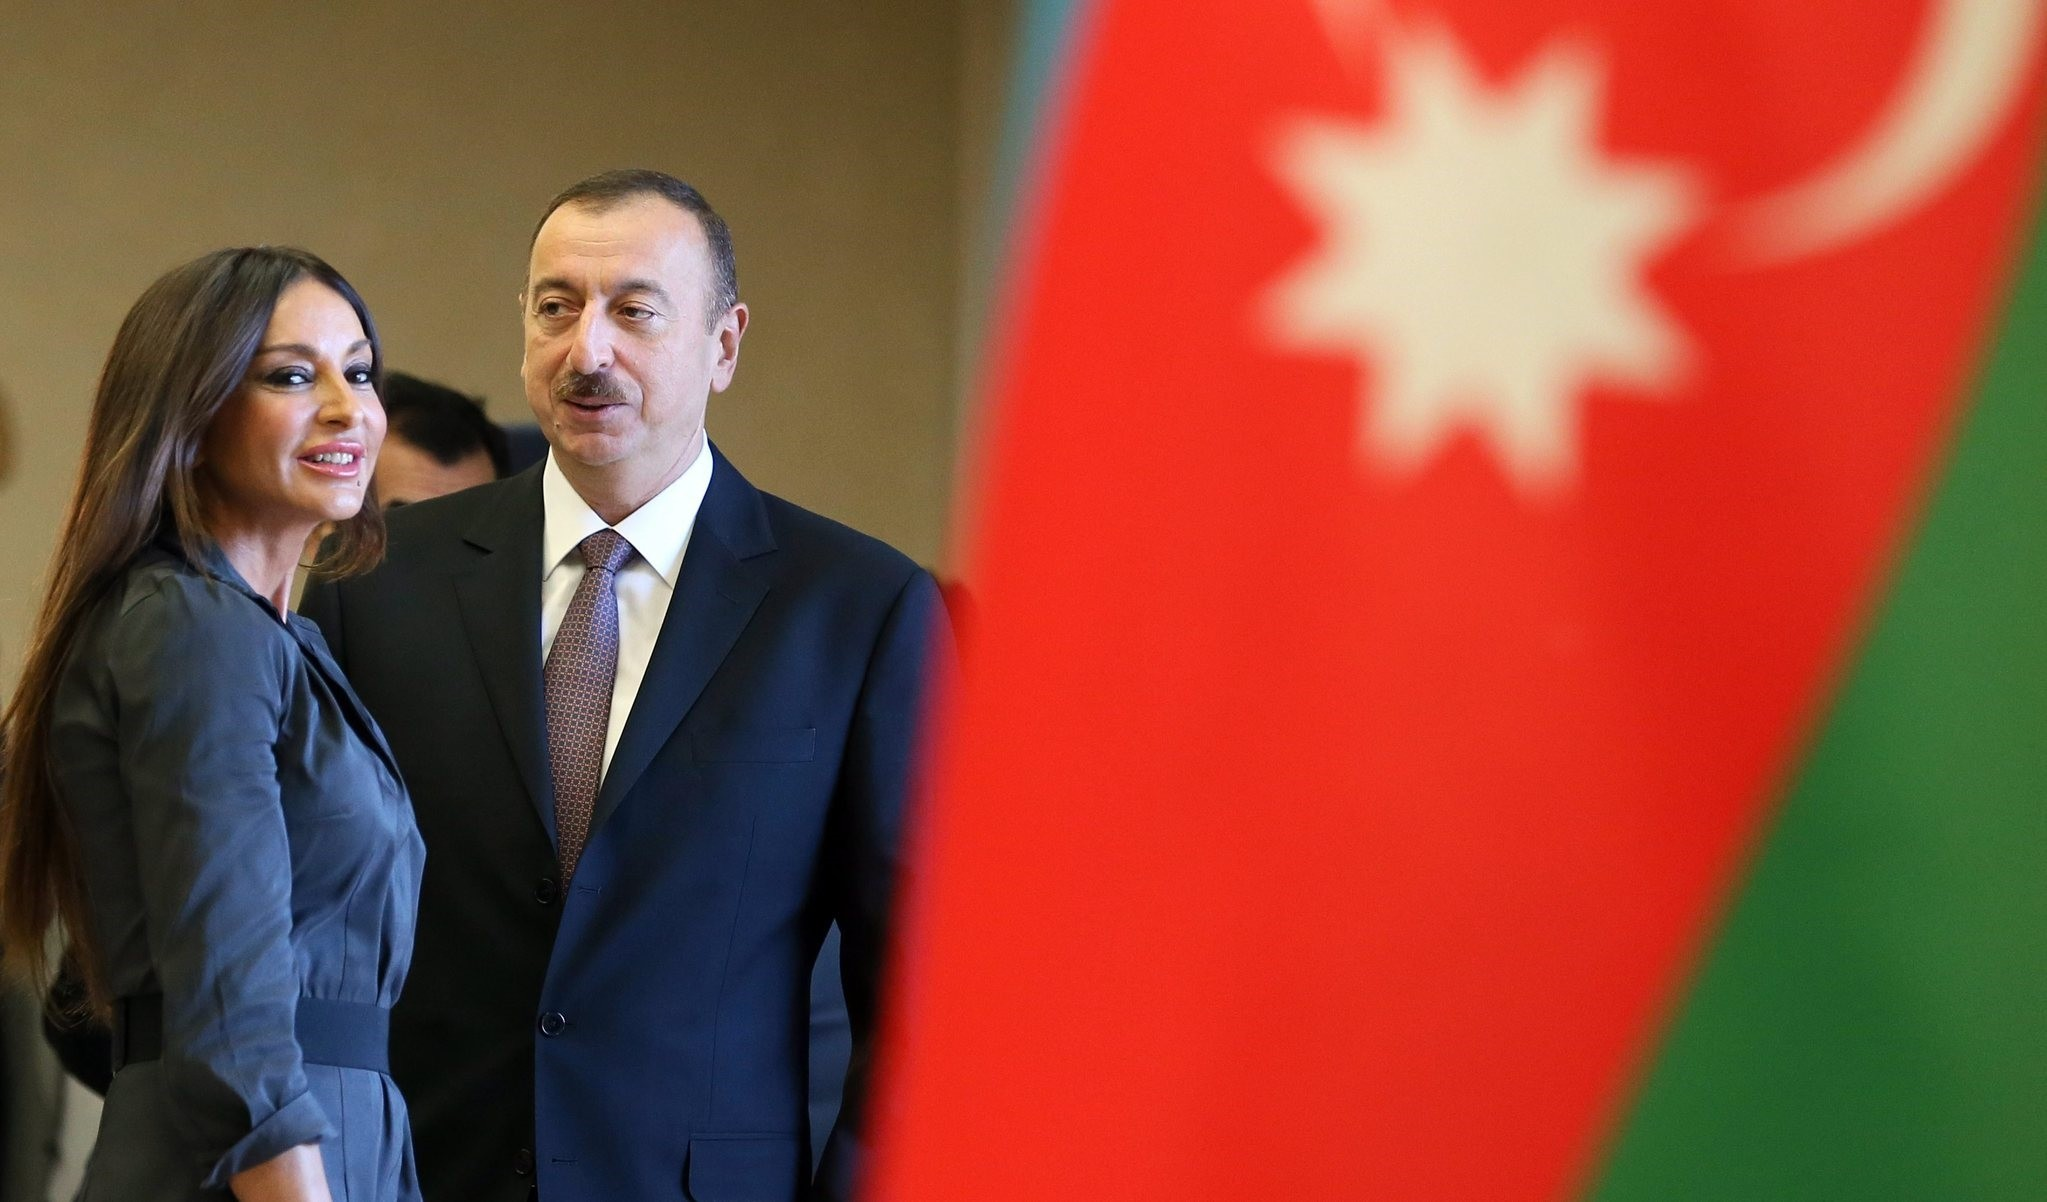 Azerbaijan's President Ilham Aliyev (C) looks at his wife Mehriban Aliyeva (L) as they pose for the media. (EPA Photo)